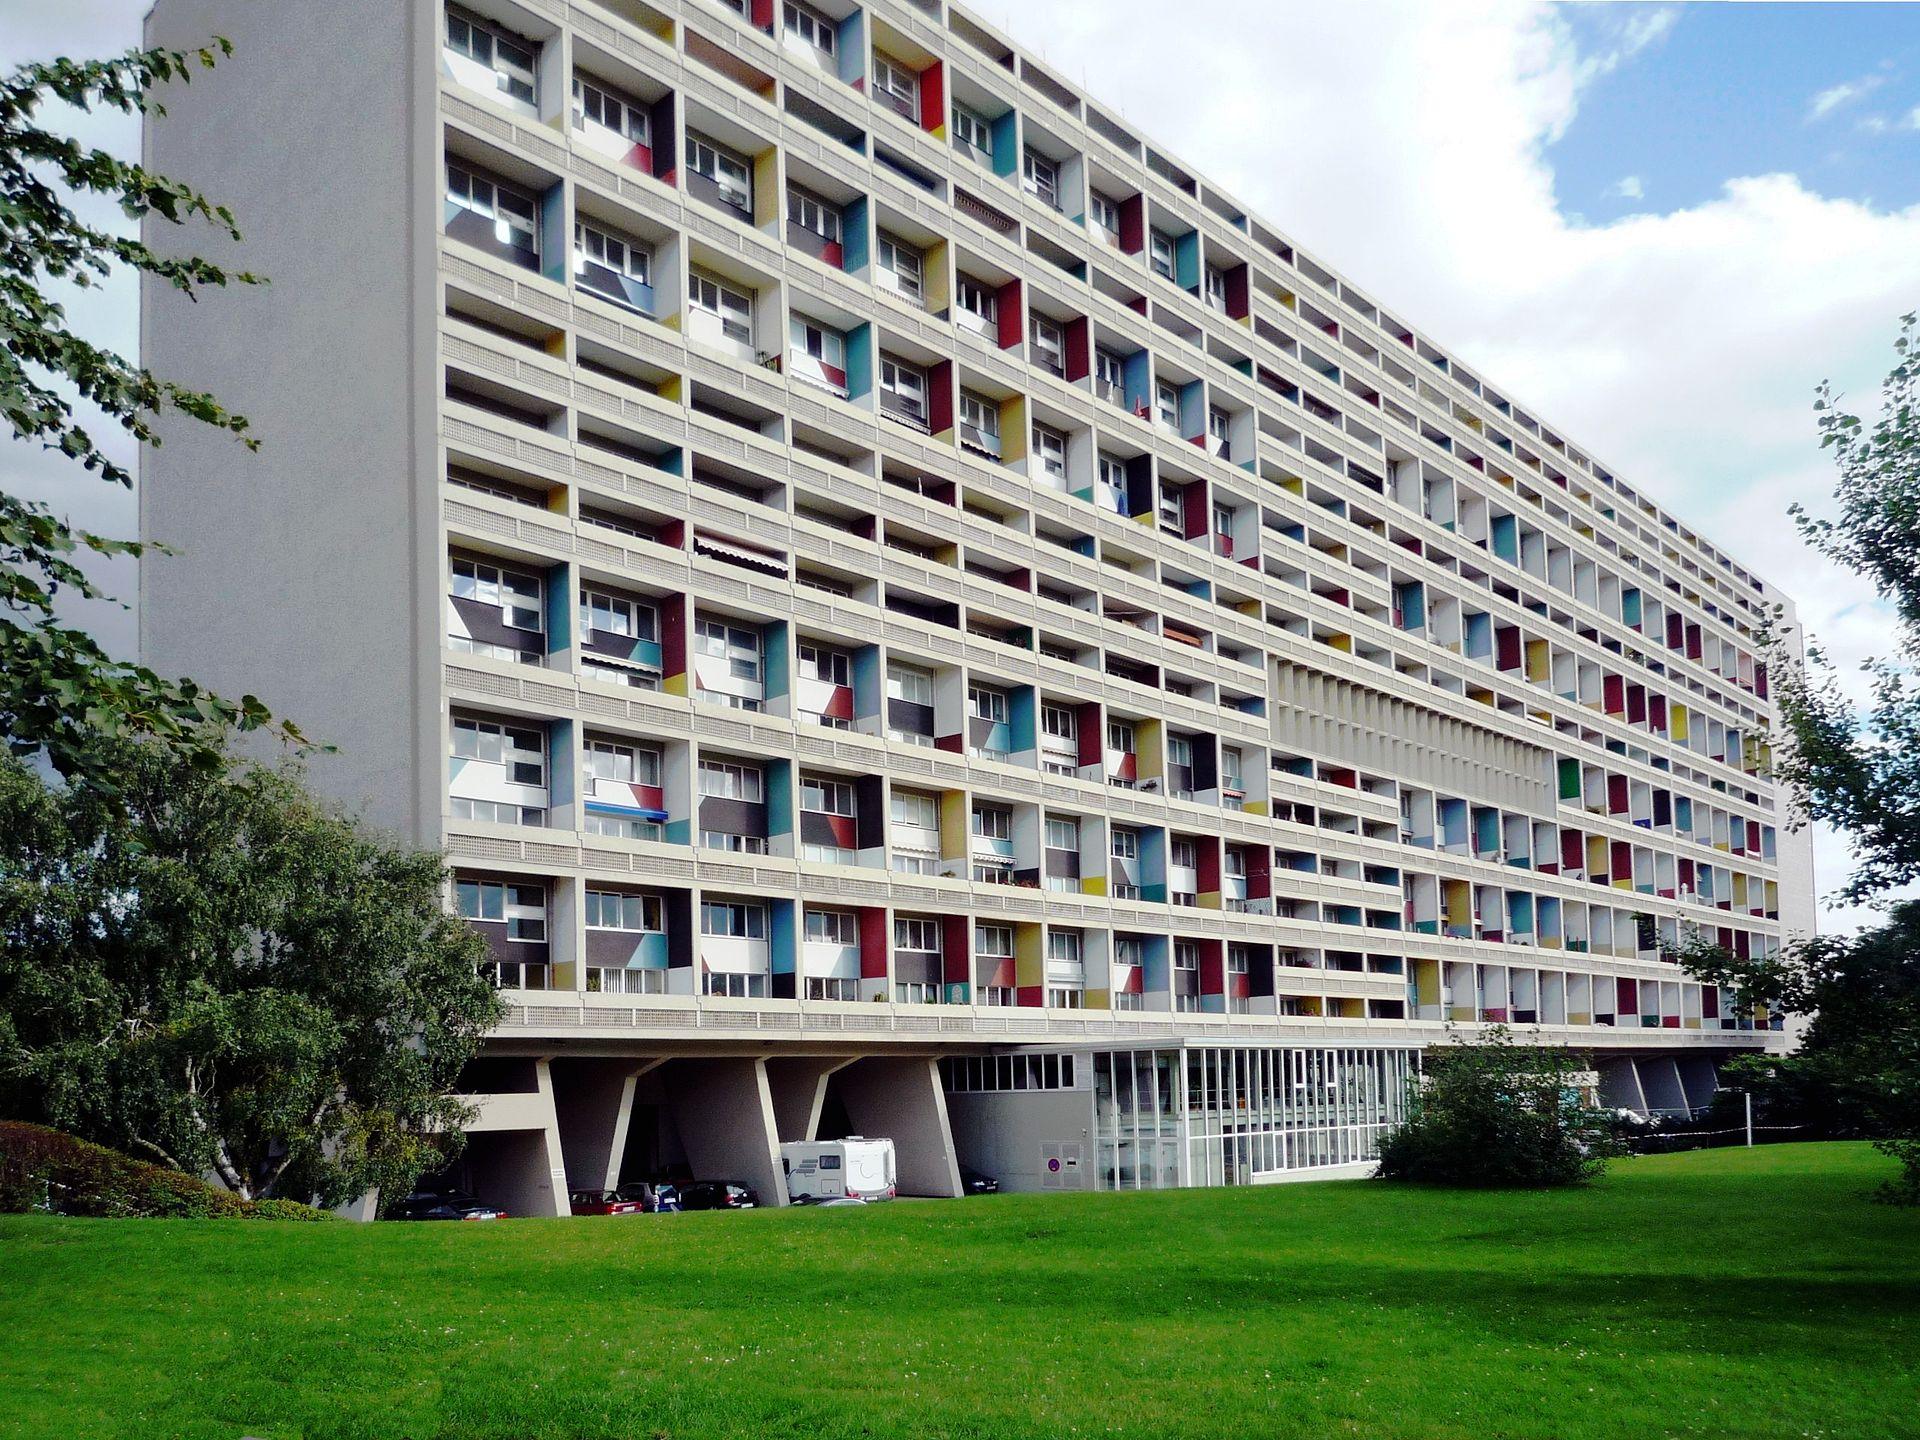 1920px-Corbusierhaus_Berlin_B